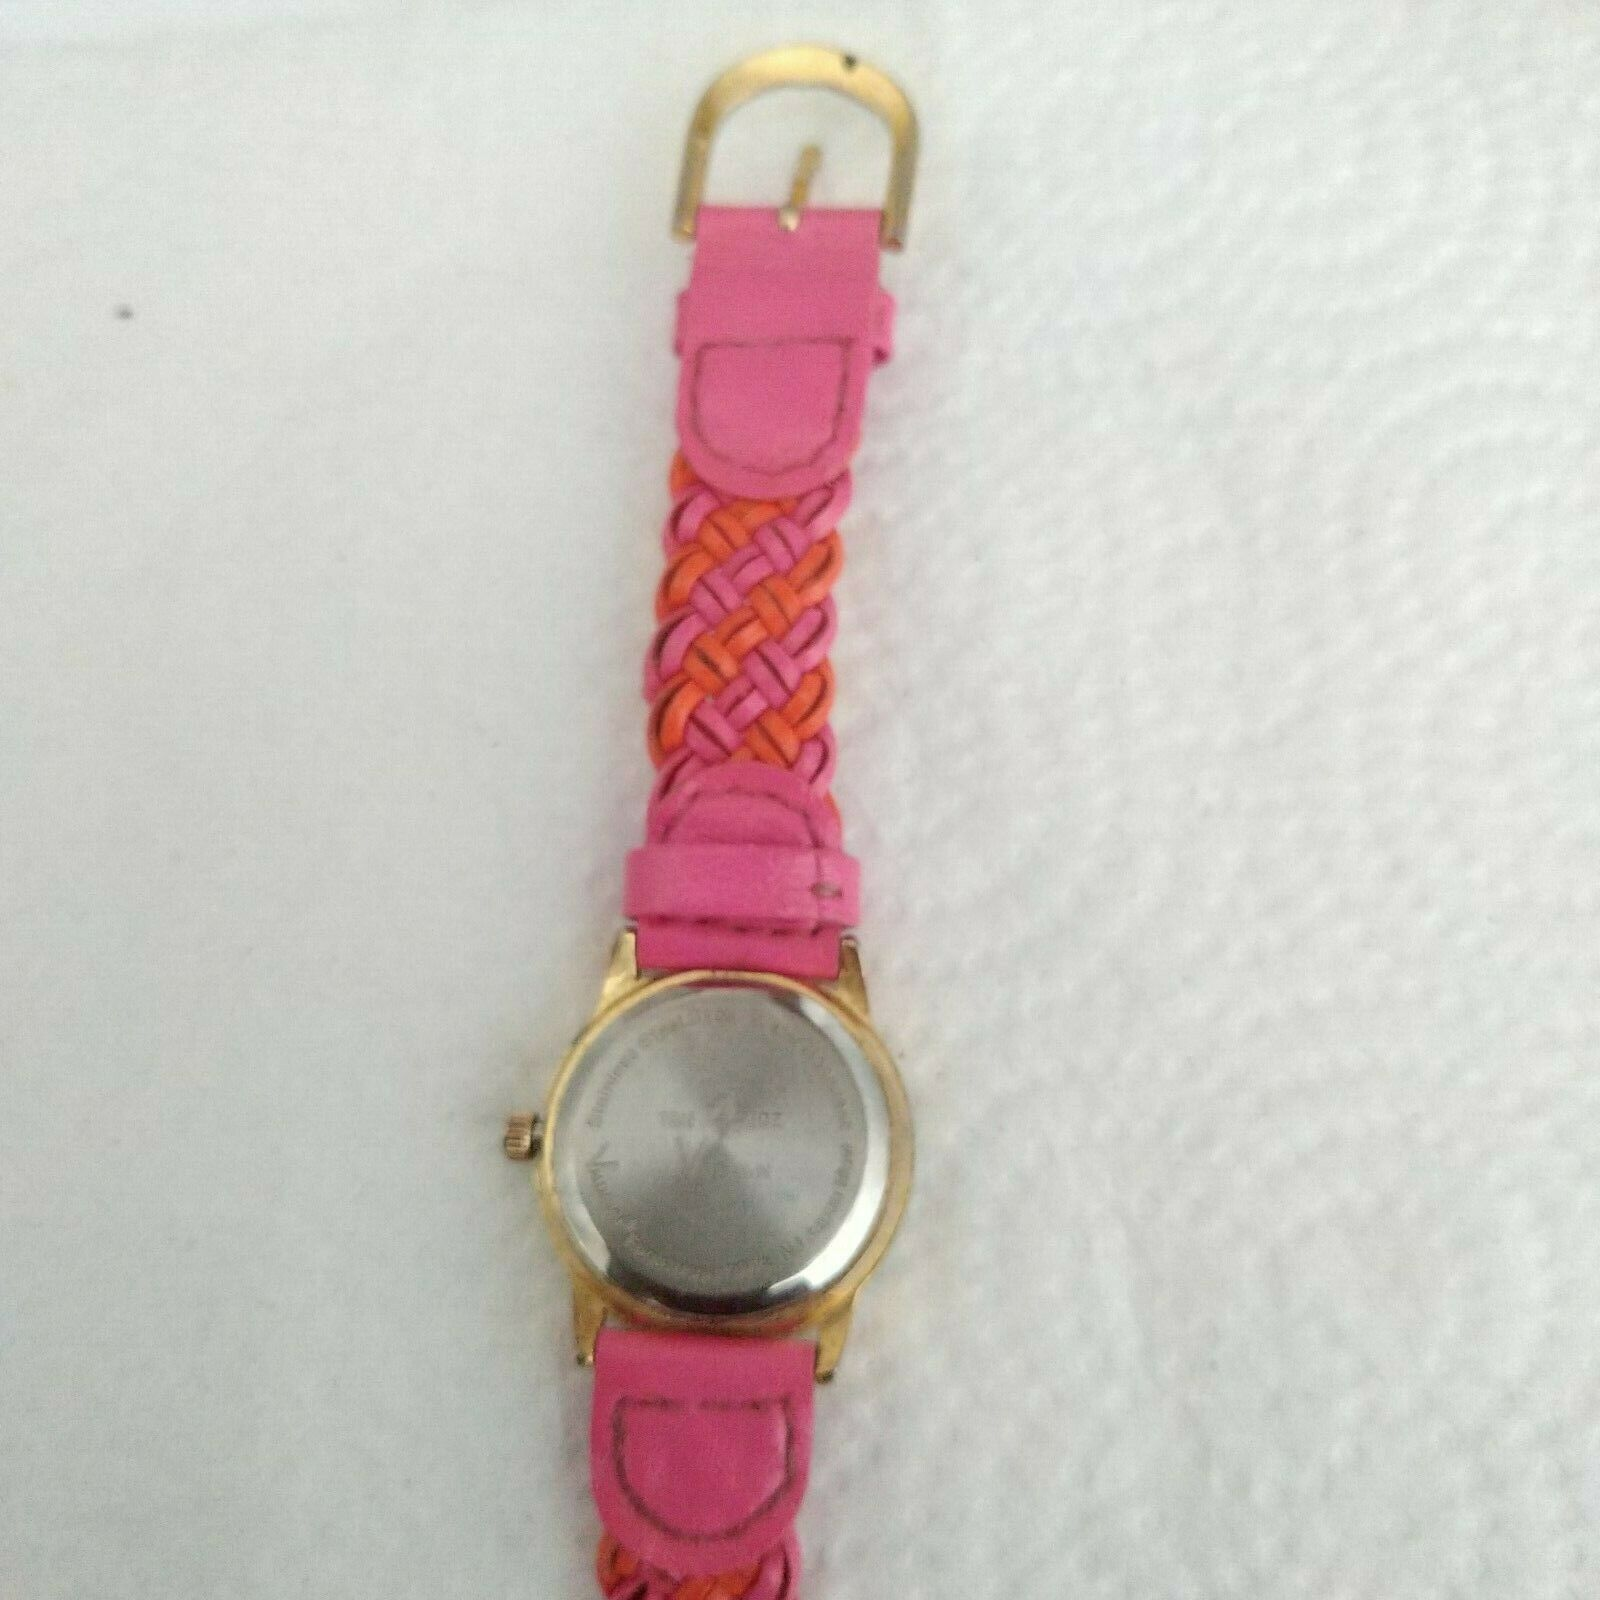 Time4Kidz Watch - Valdawn Vintage Water ressistant  Pink Leather Strap image 6